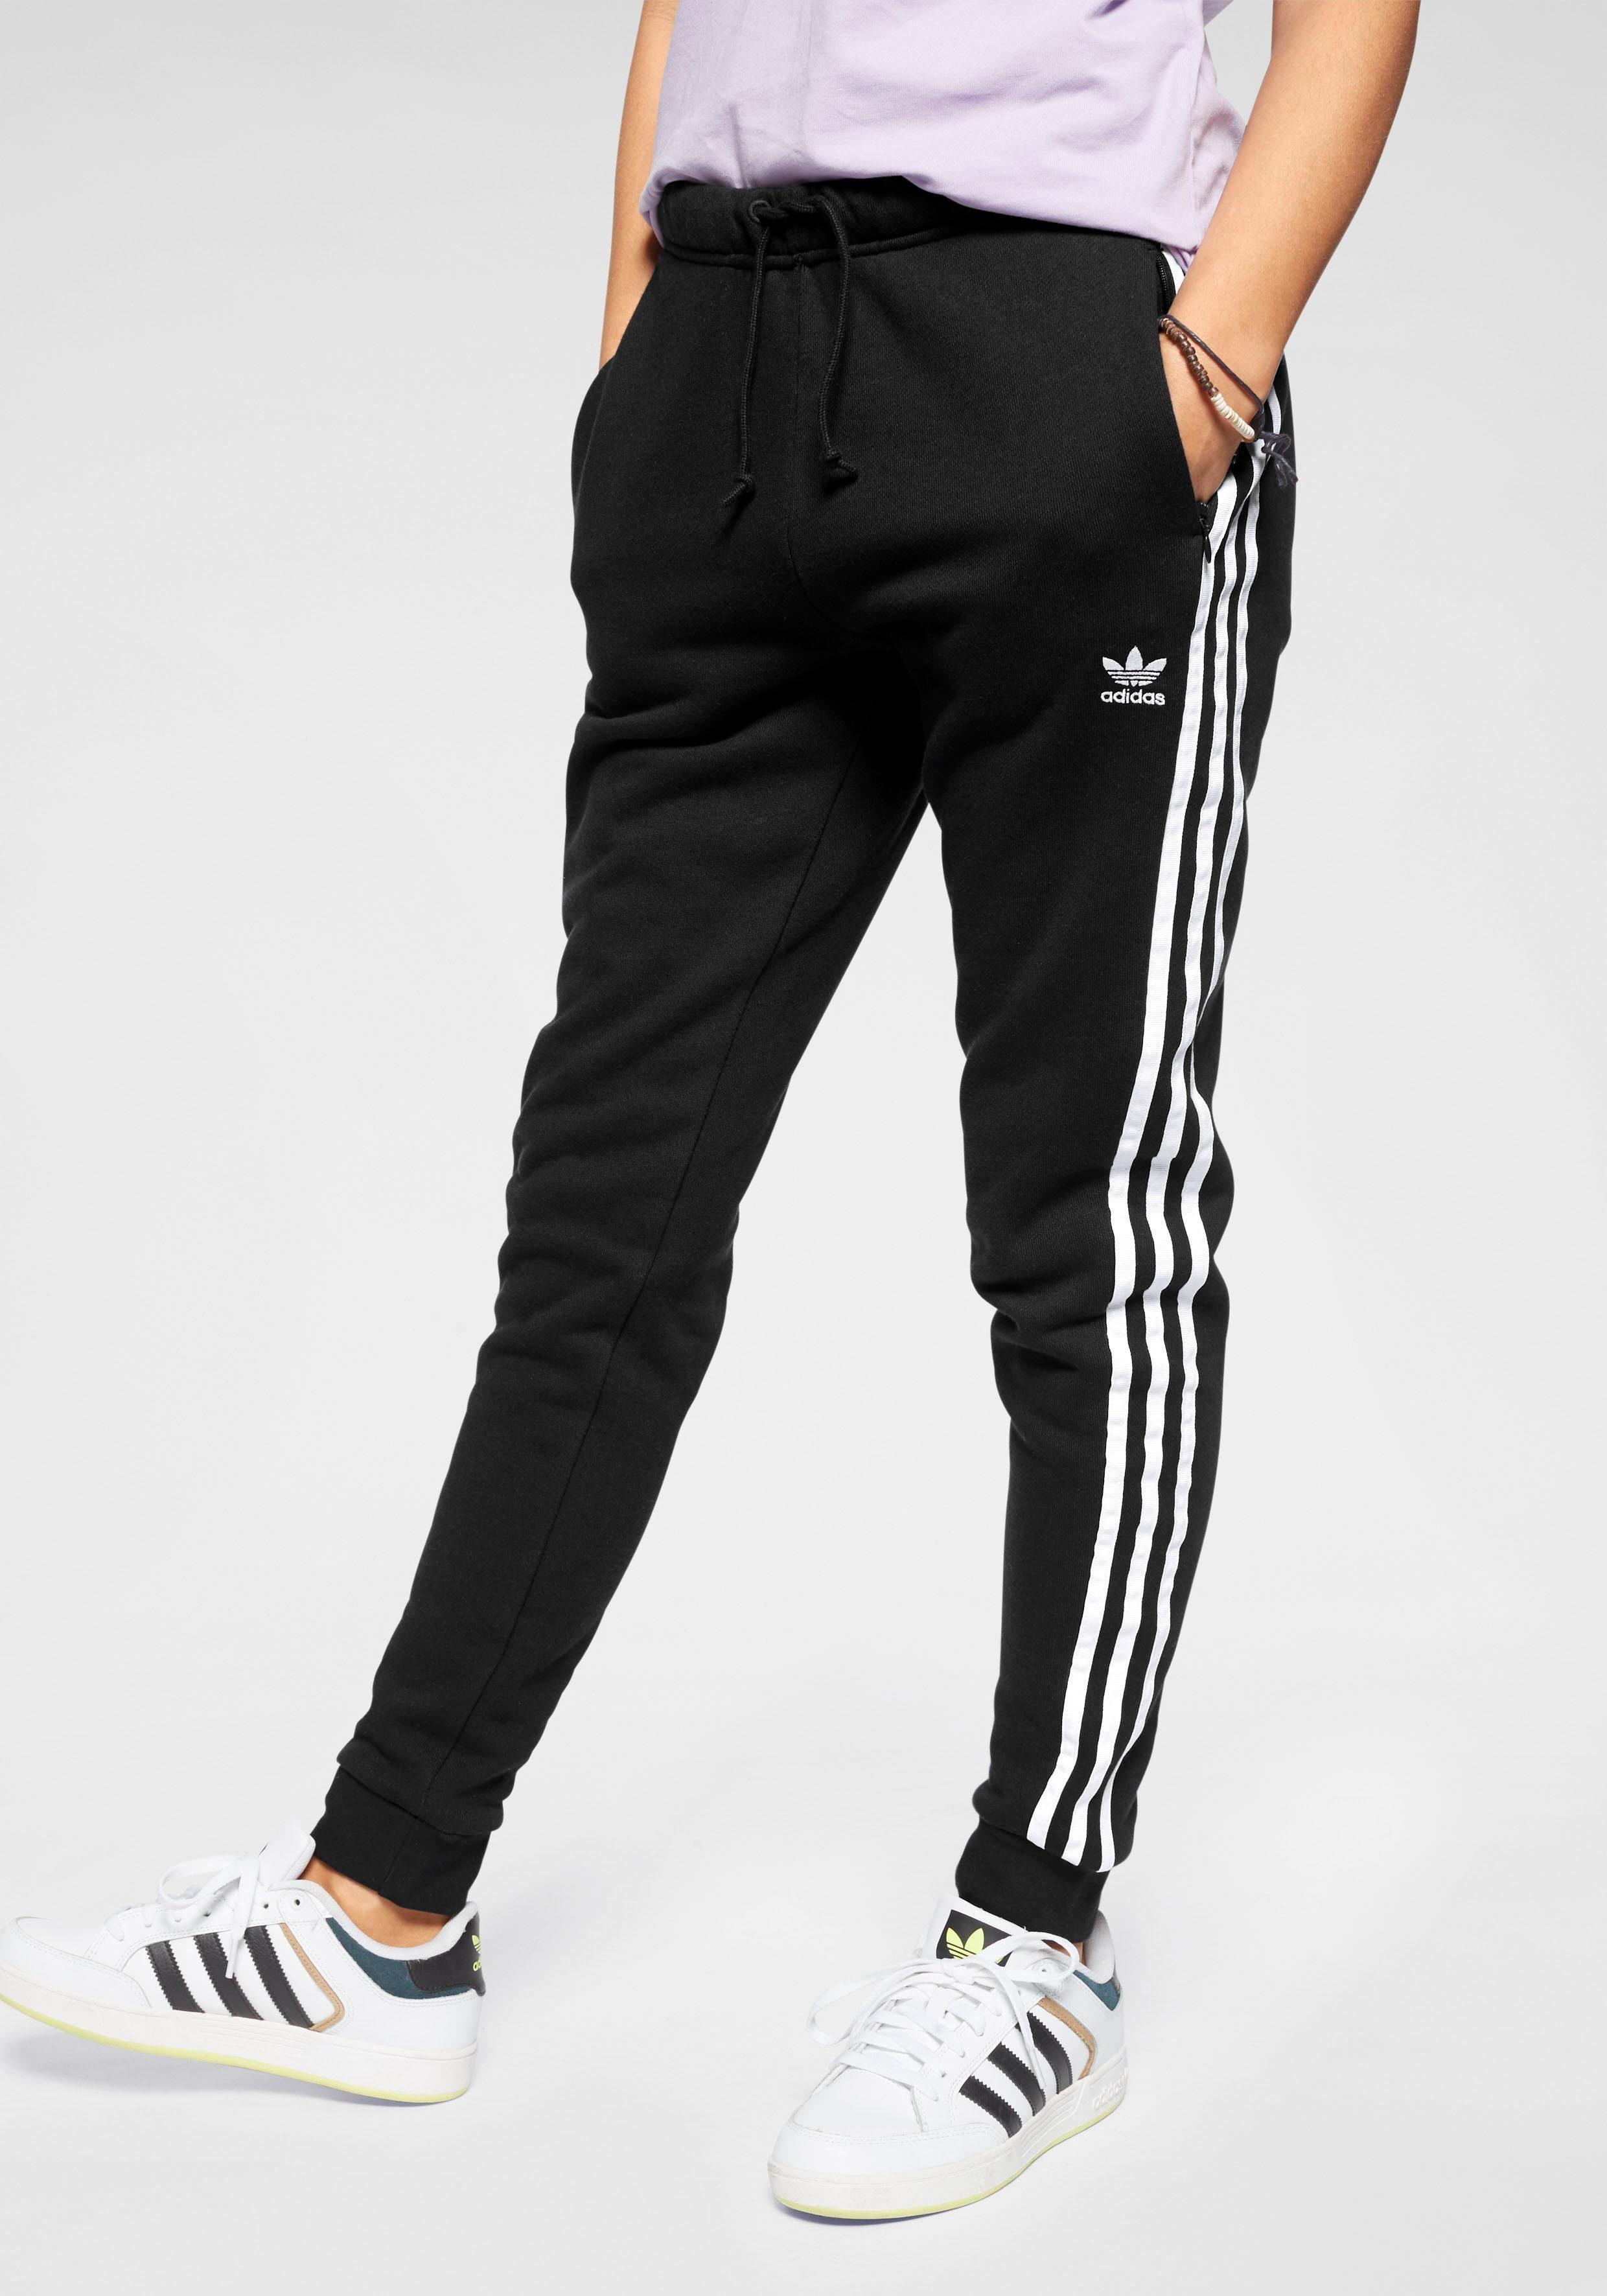 adidas originals damen jogginghose